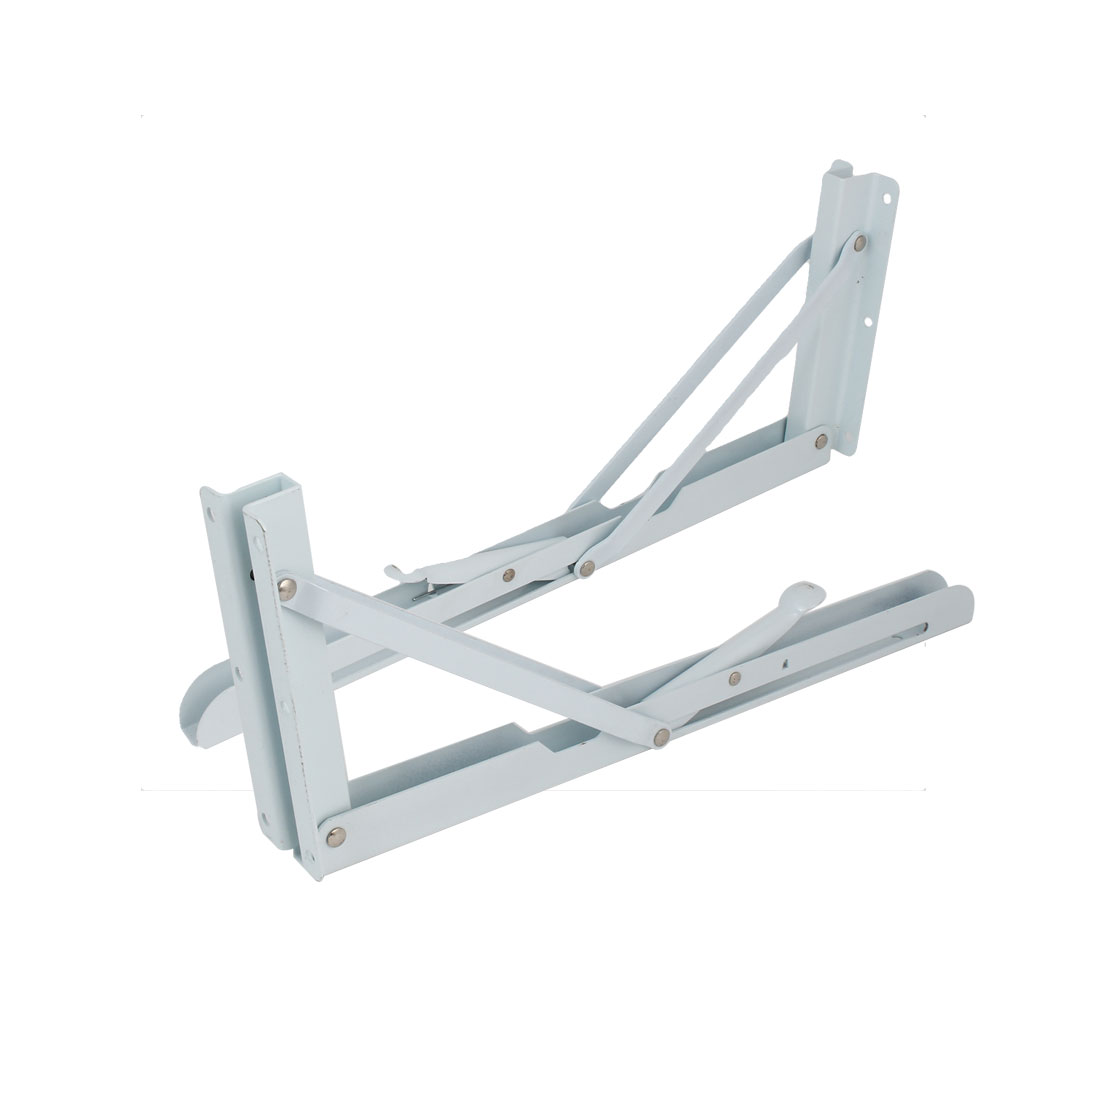 345mm-x-42mm-x-150mm-Metal-Triangle-Folding-Support-Shelf-Bracket-White-2pcs